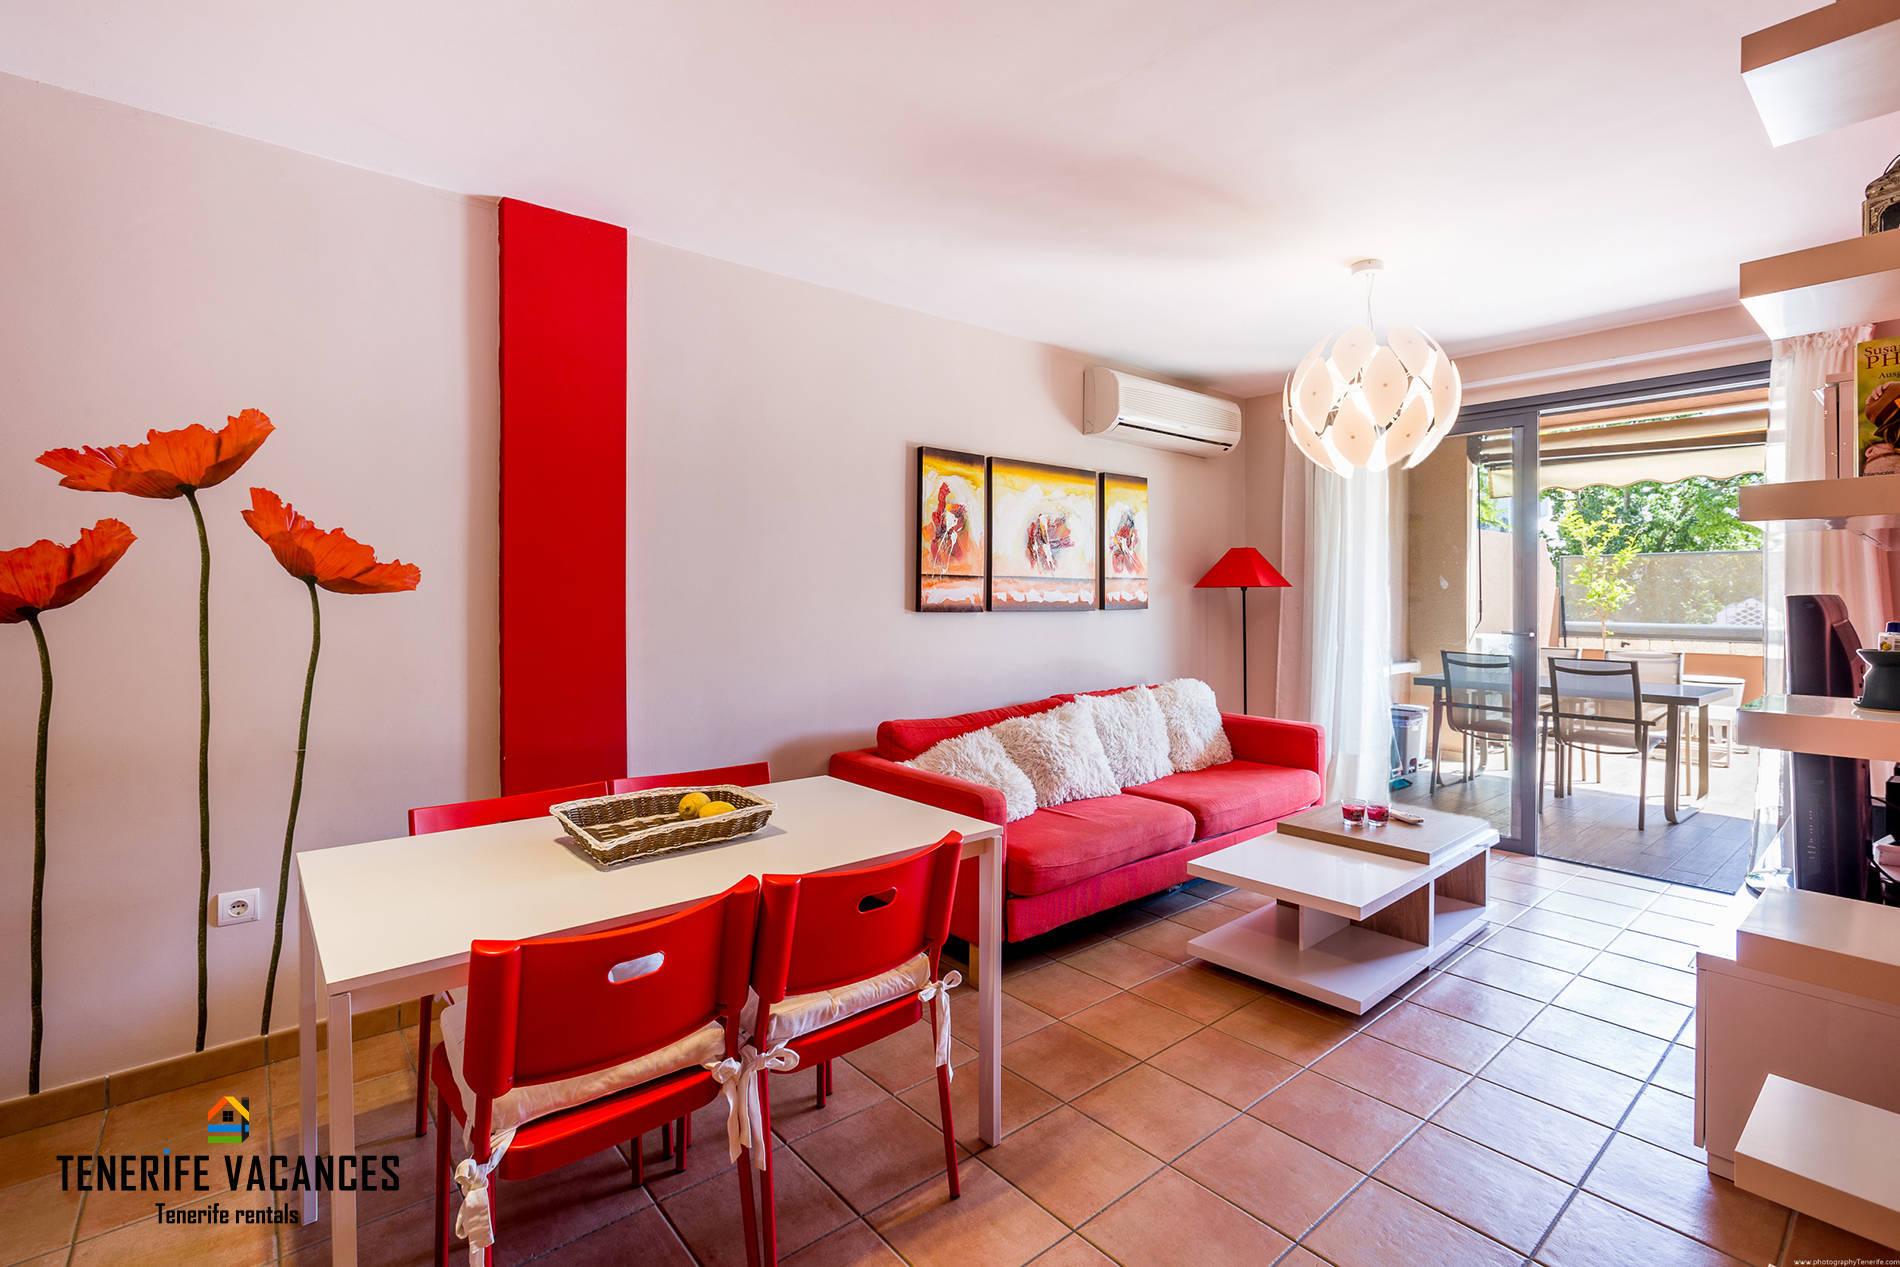 apartamento residencial tenerife playa paraiso tenerife vacances